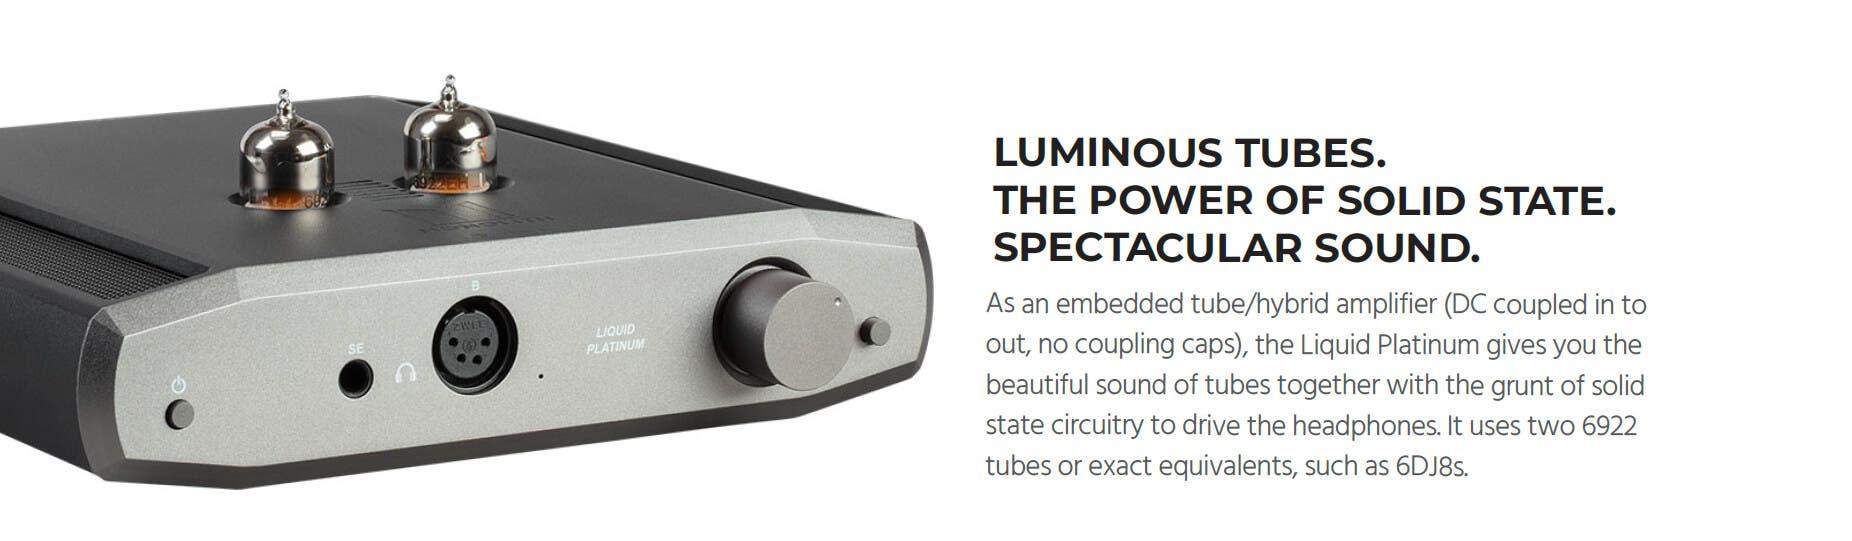 Monolith By Monoprice Liquid Platinum Headphone Amplifier Alex Dc Coupled Audio Support Files